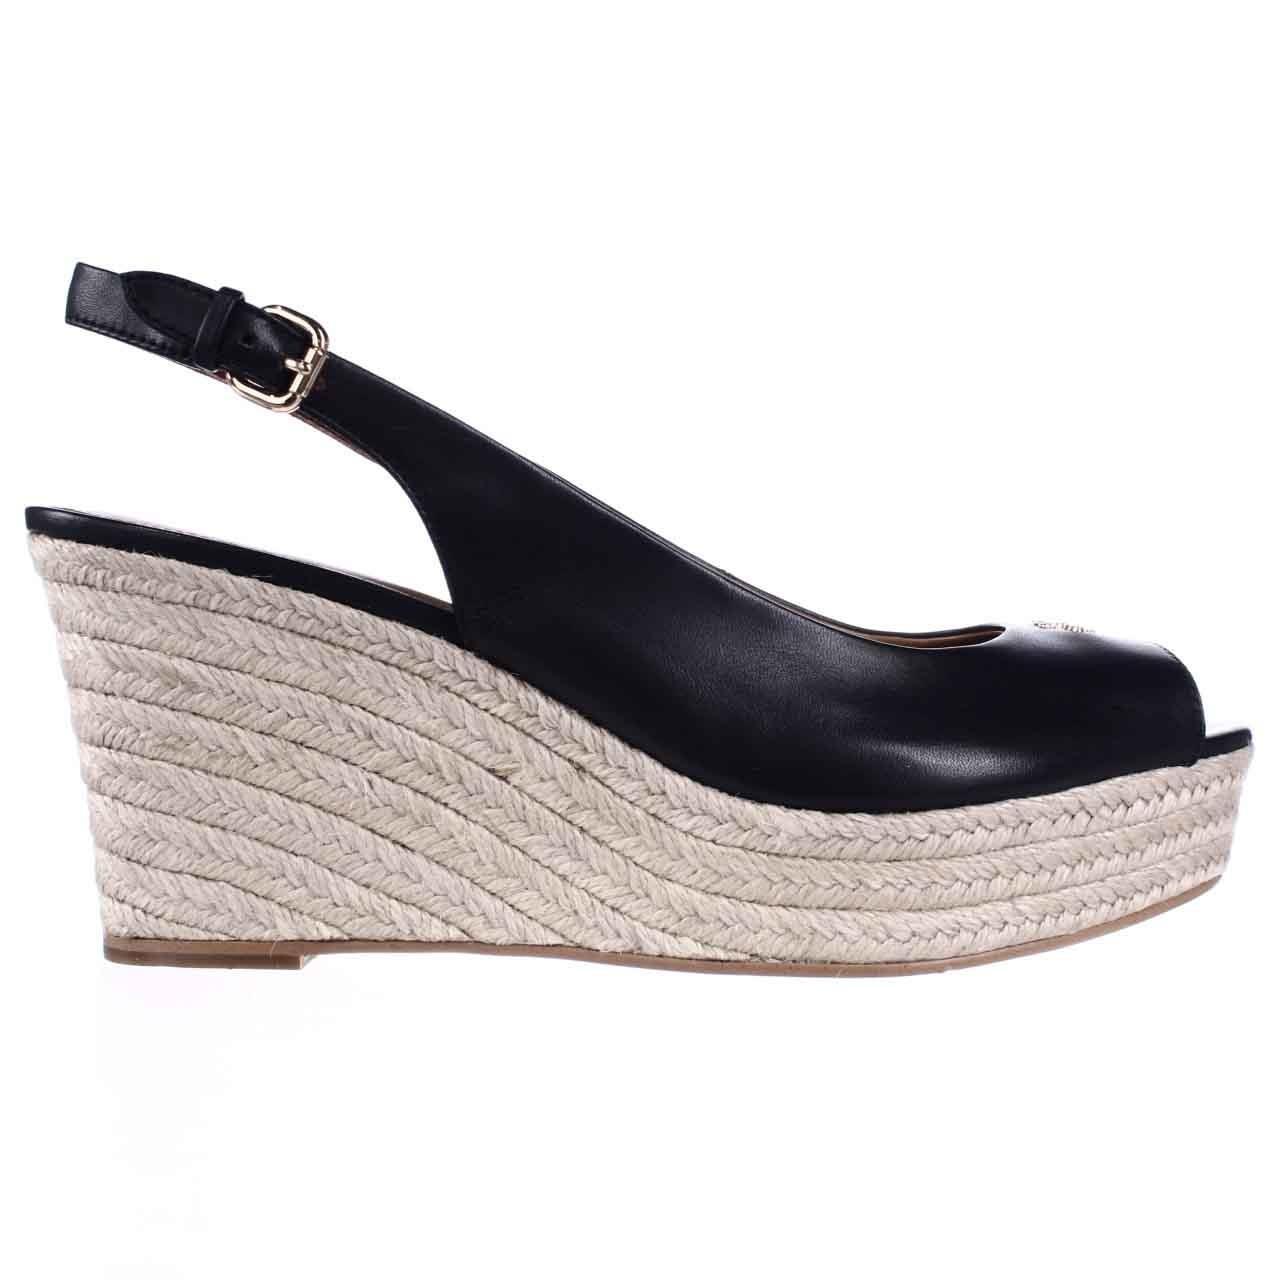 Coach Ferry Peep Toe Slingback Espadrille Wedge Sandals in ...